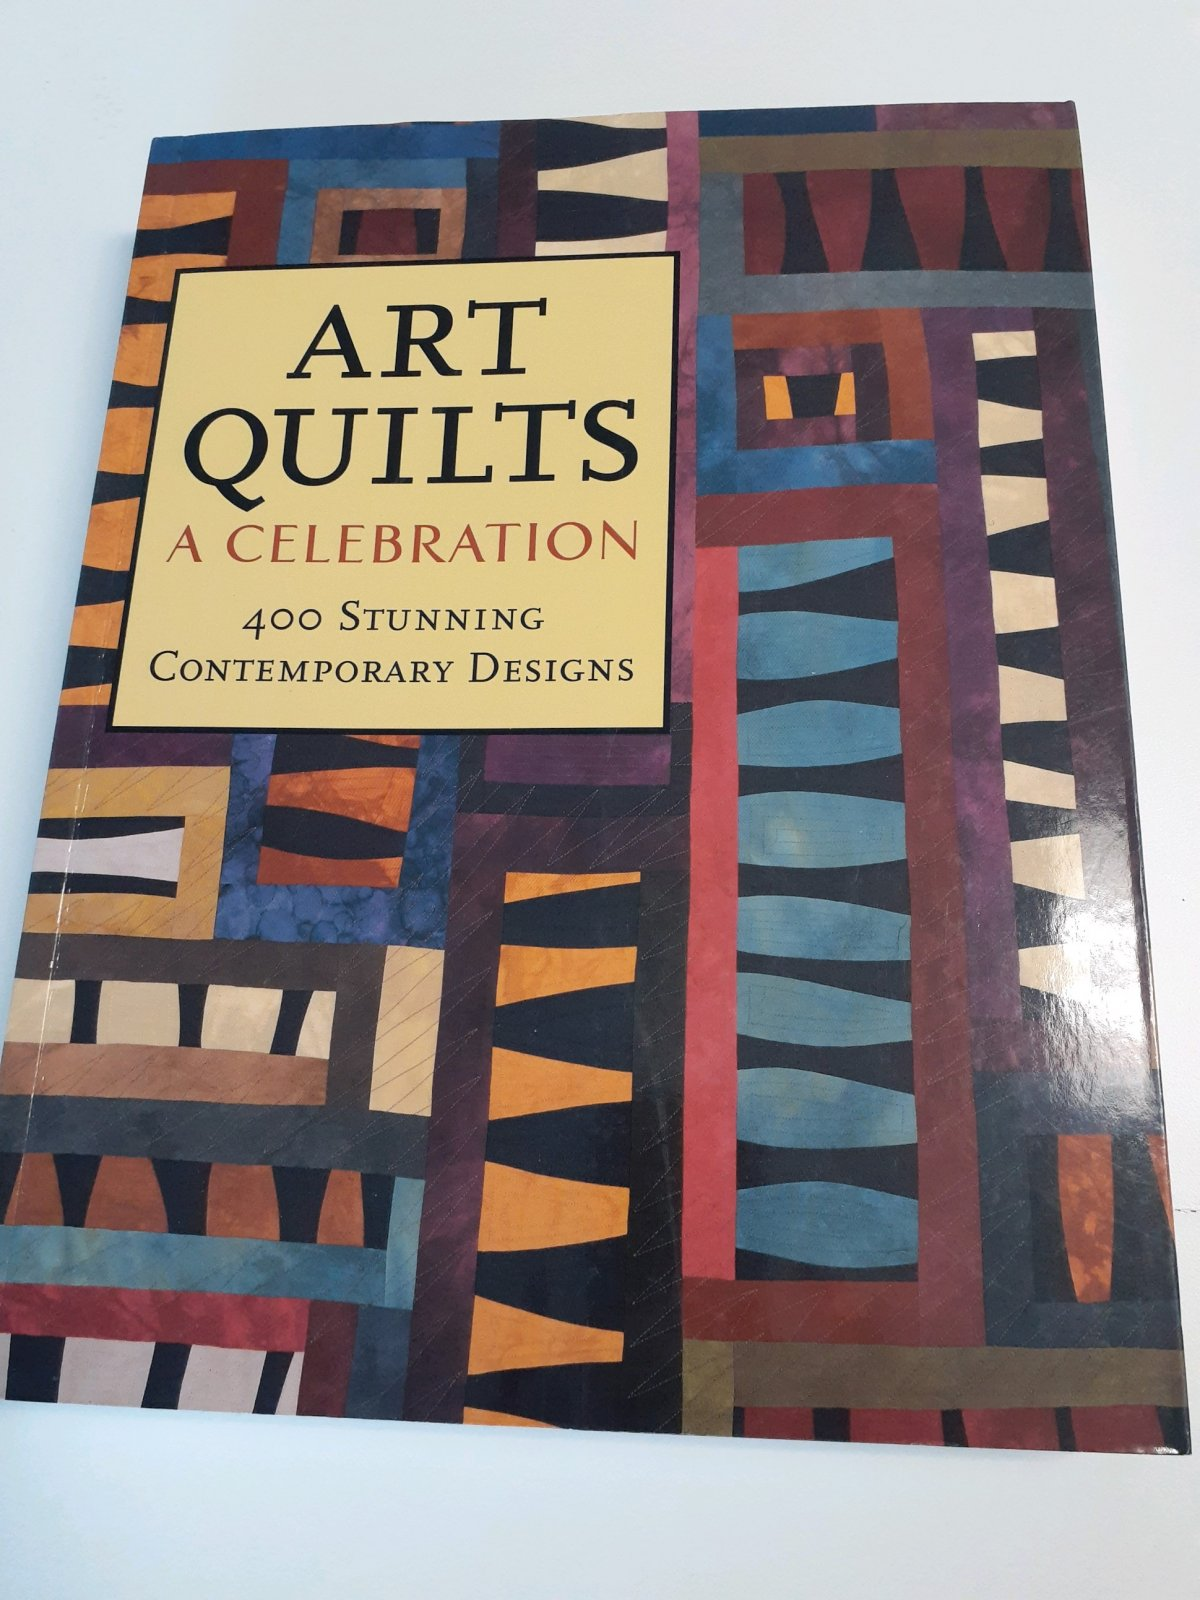 Art Quilts A Celebration - 400 Stunning Contemporary Designs